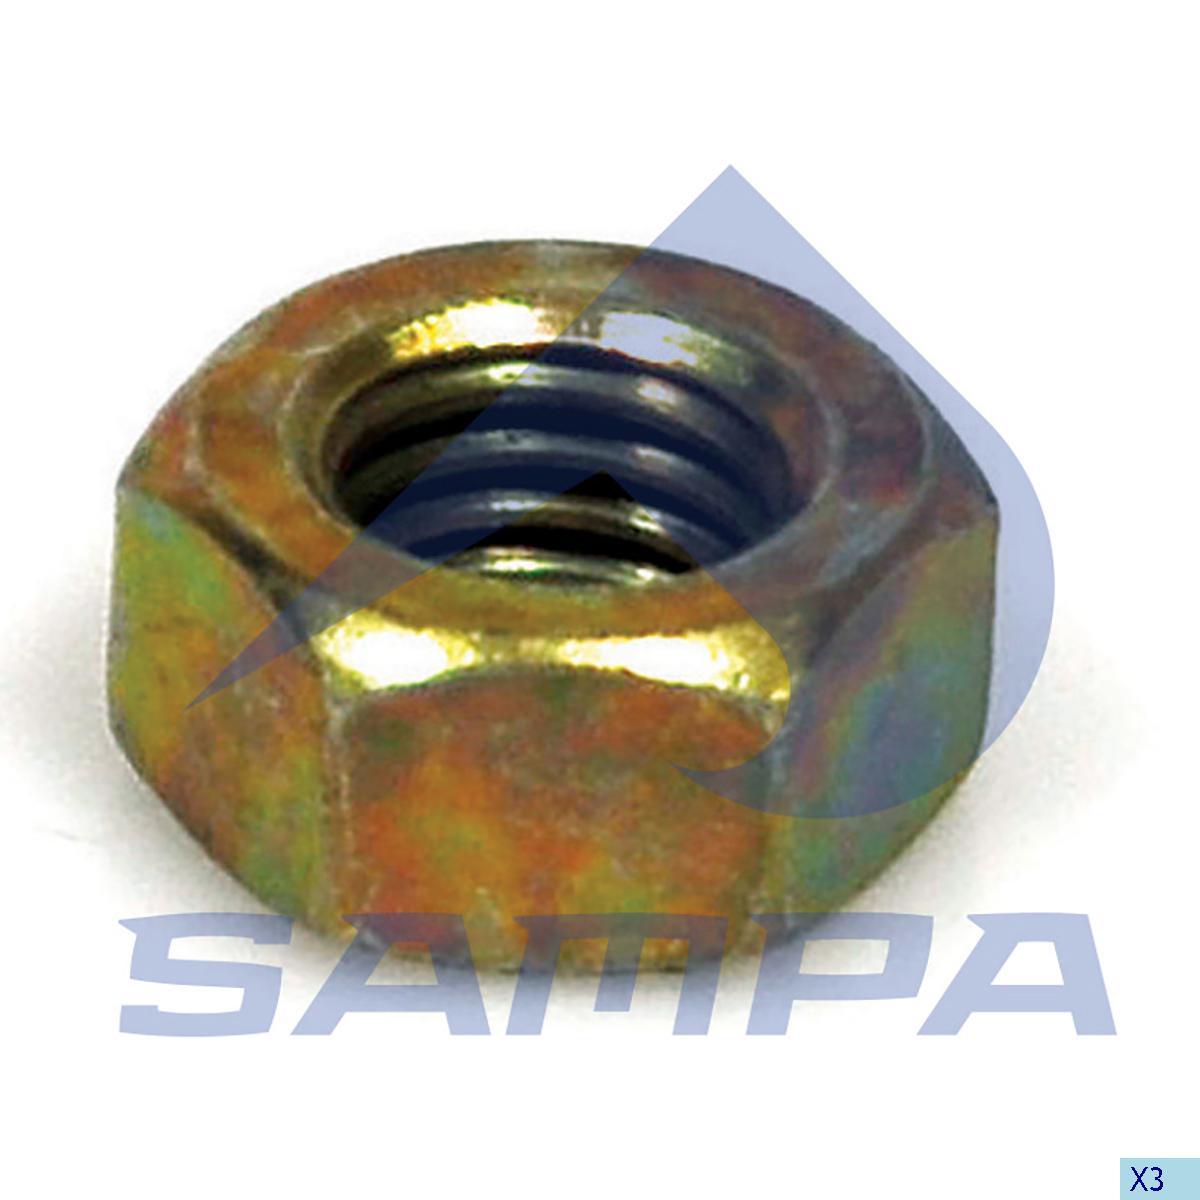 Nut, Propeller Shaft Bearing, Scania, Propeller Shaft